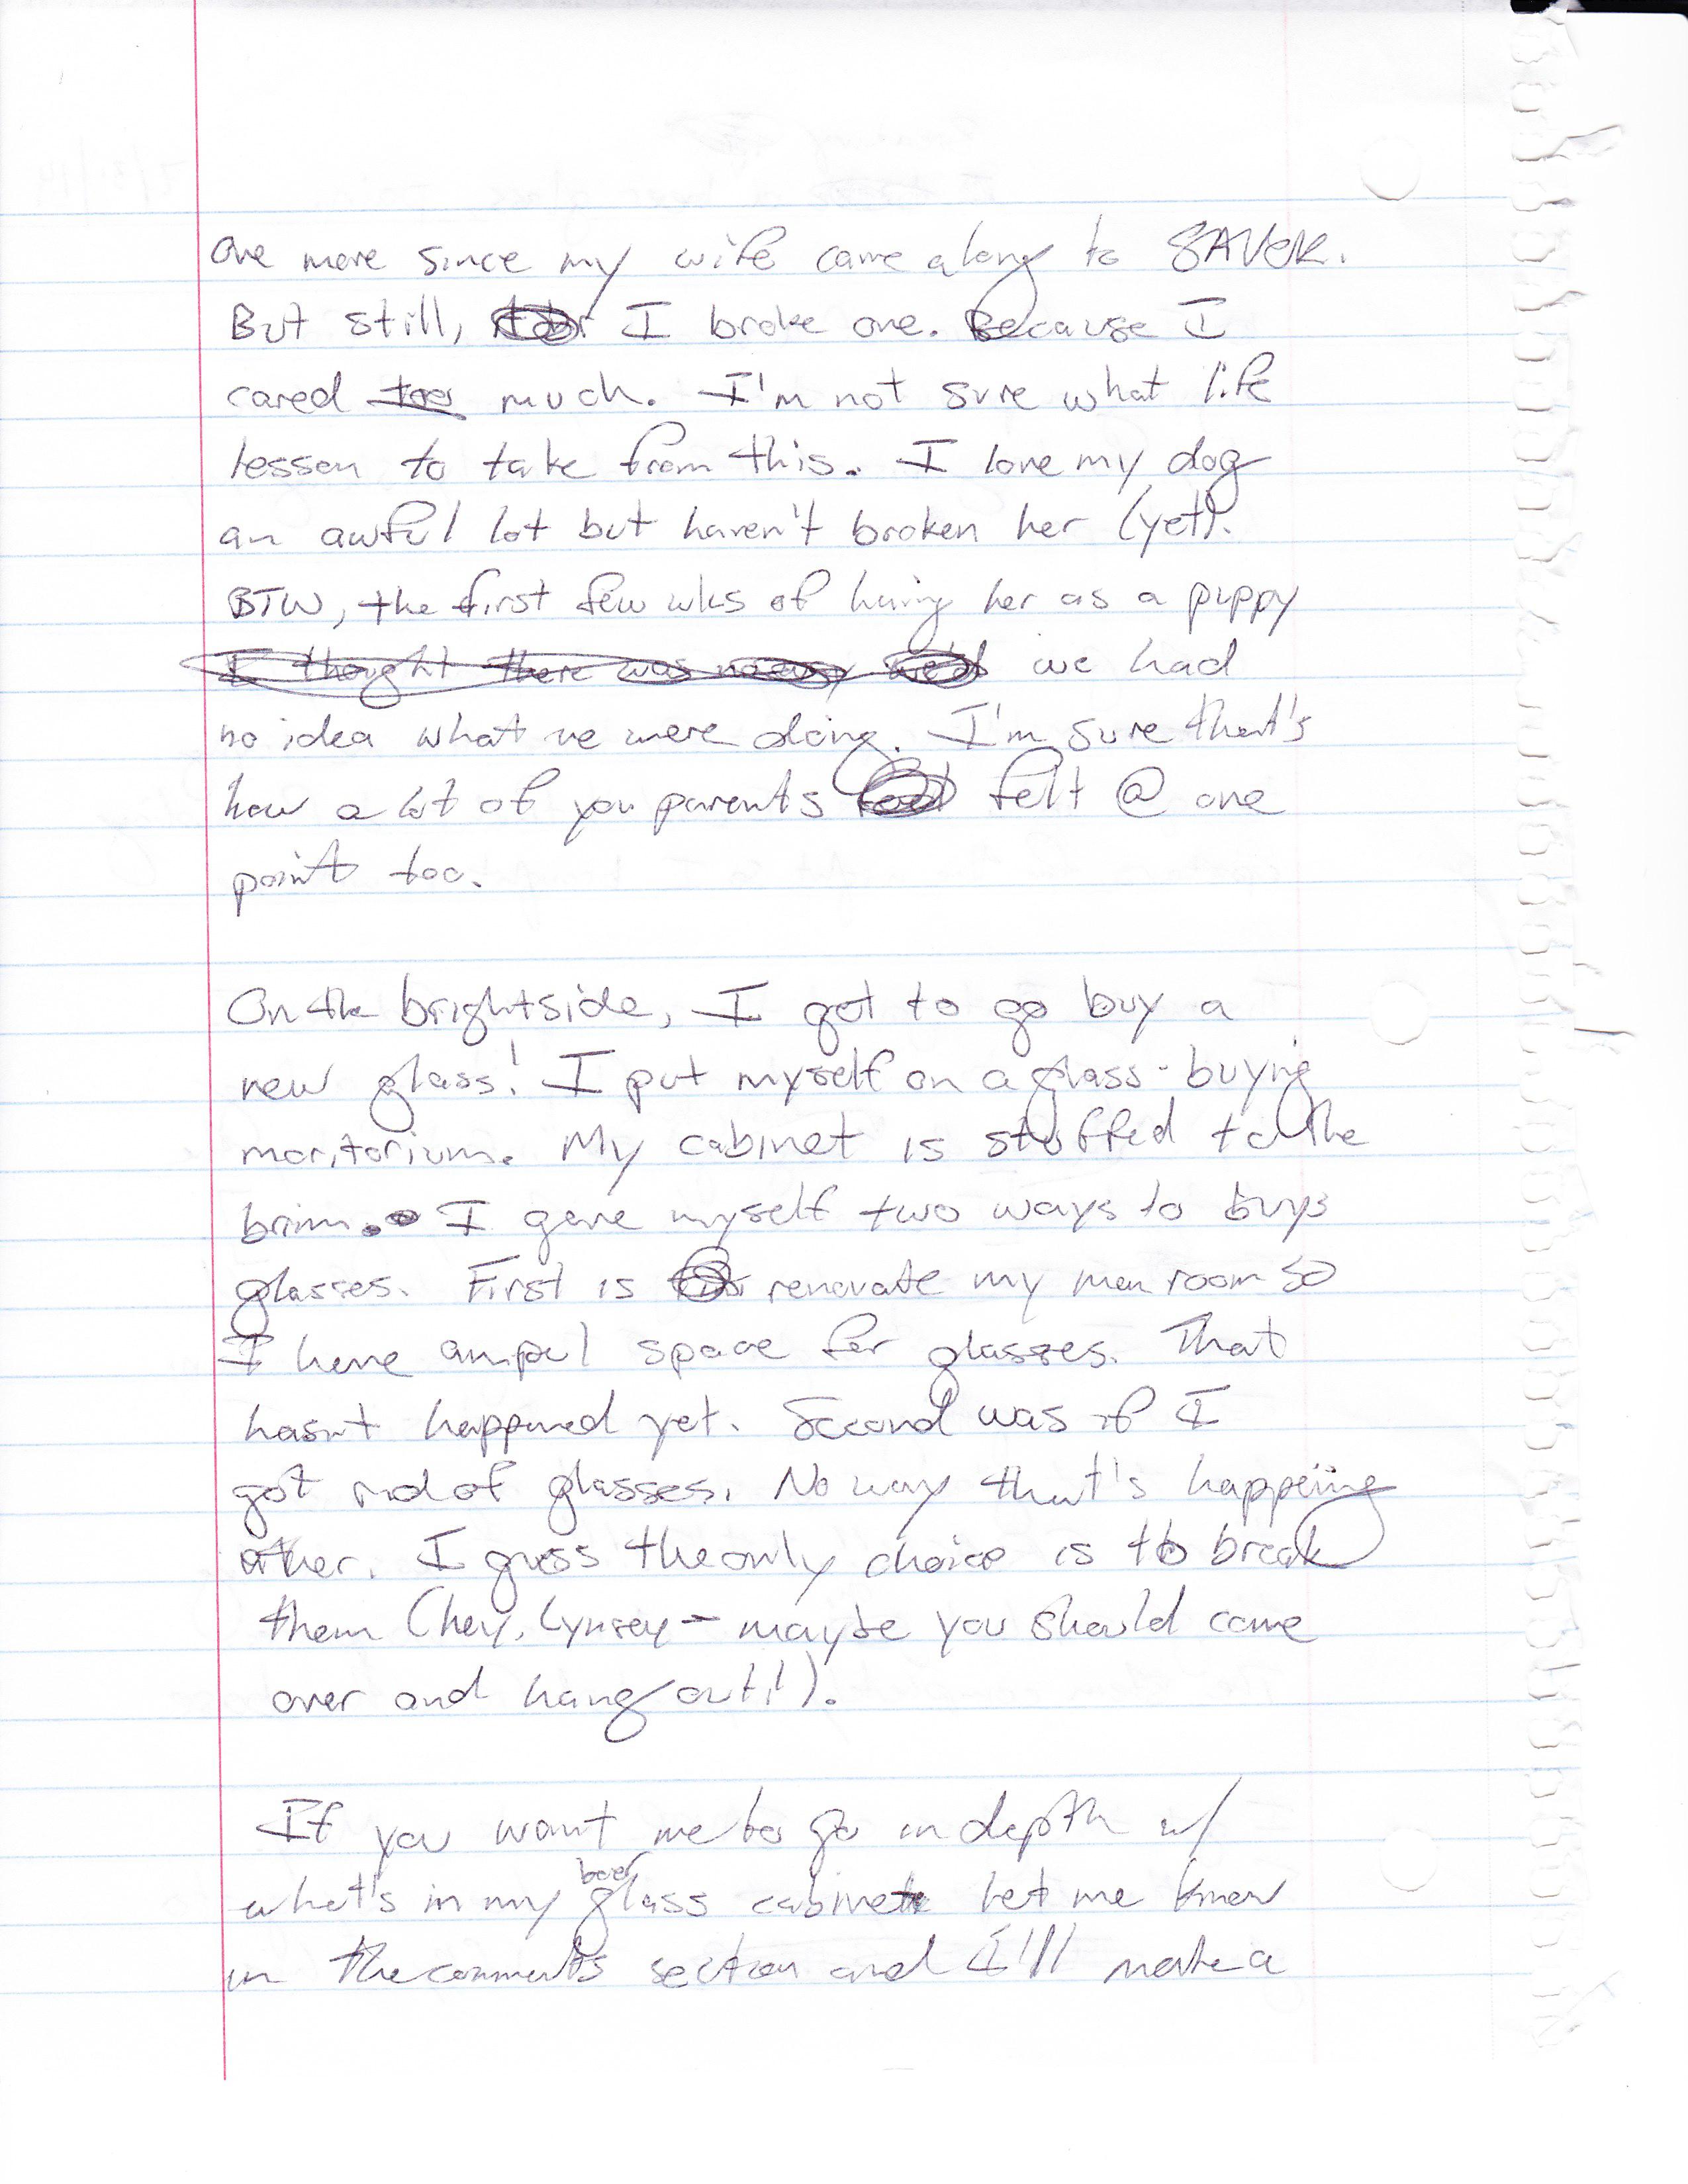 019 Essay Example Breakingabeerglass Handwritten2 Word Dreaded 1000 Pages Full